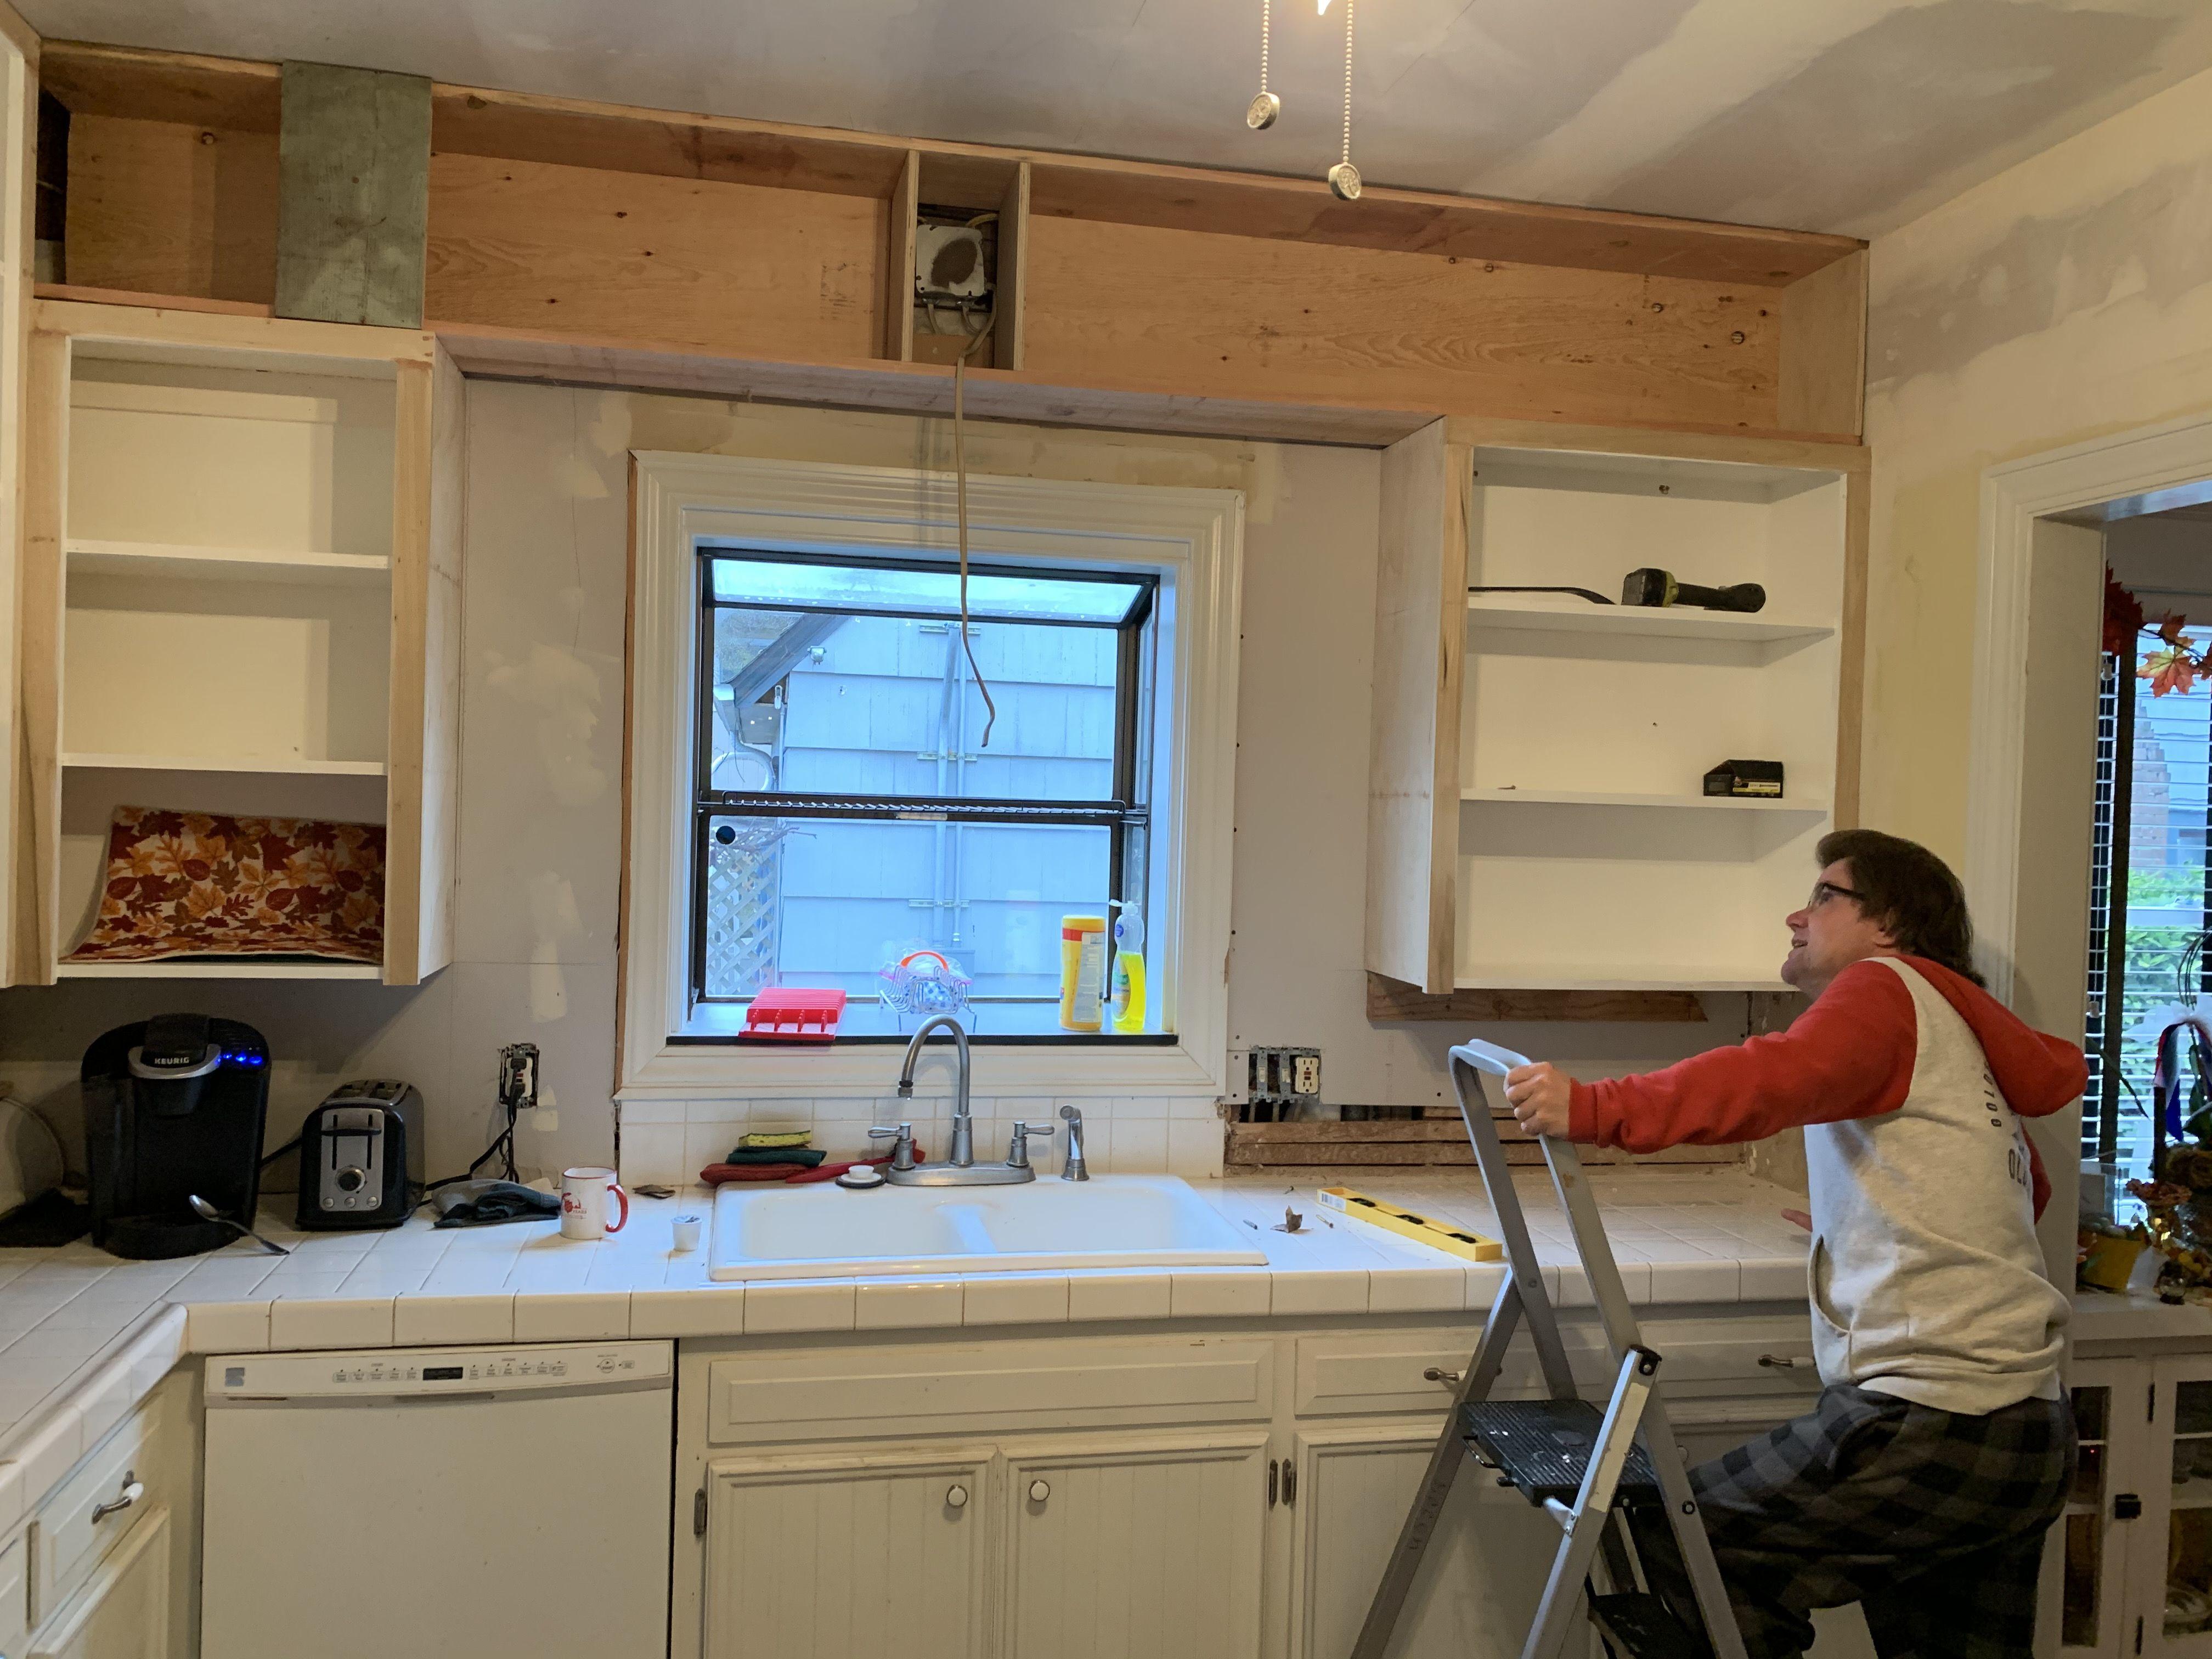 Pin By Sjacobsen On Shari S Kitchen Kitchen Cabinets Home Decor Kitchen